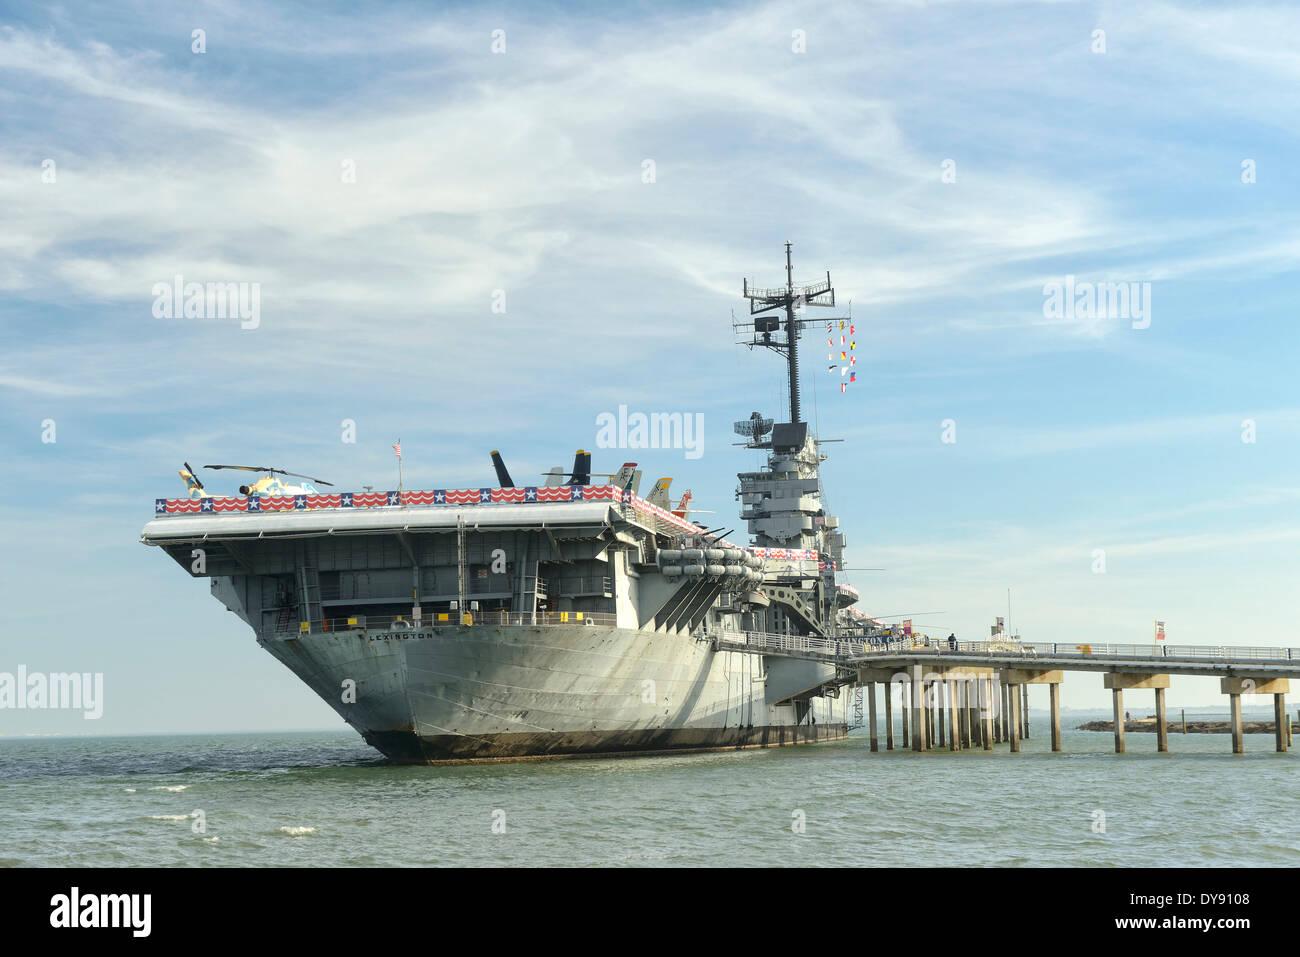 USA, United States, America, Texas, Corpus Christi, USS Lexington, Museum, Aircraft Carrier, ship, military - Stock Image